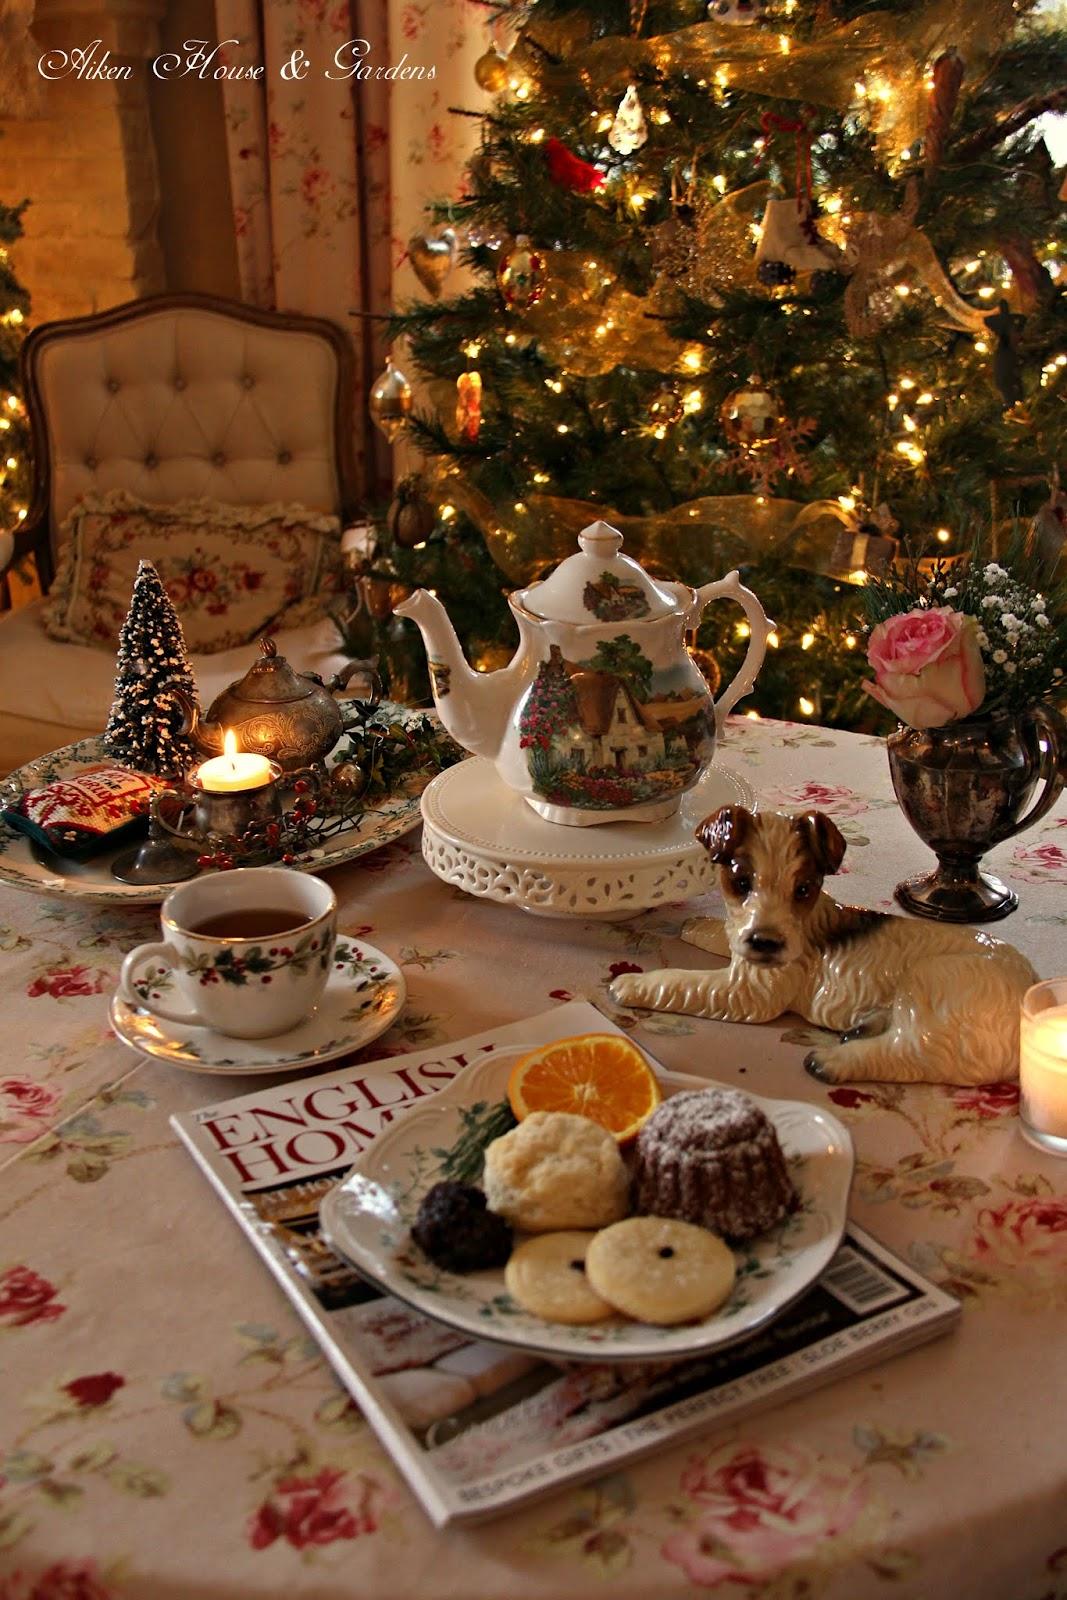 Aiken House  Gardens Christmas English Afternoon Tea